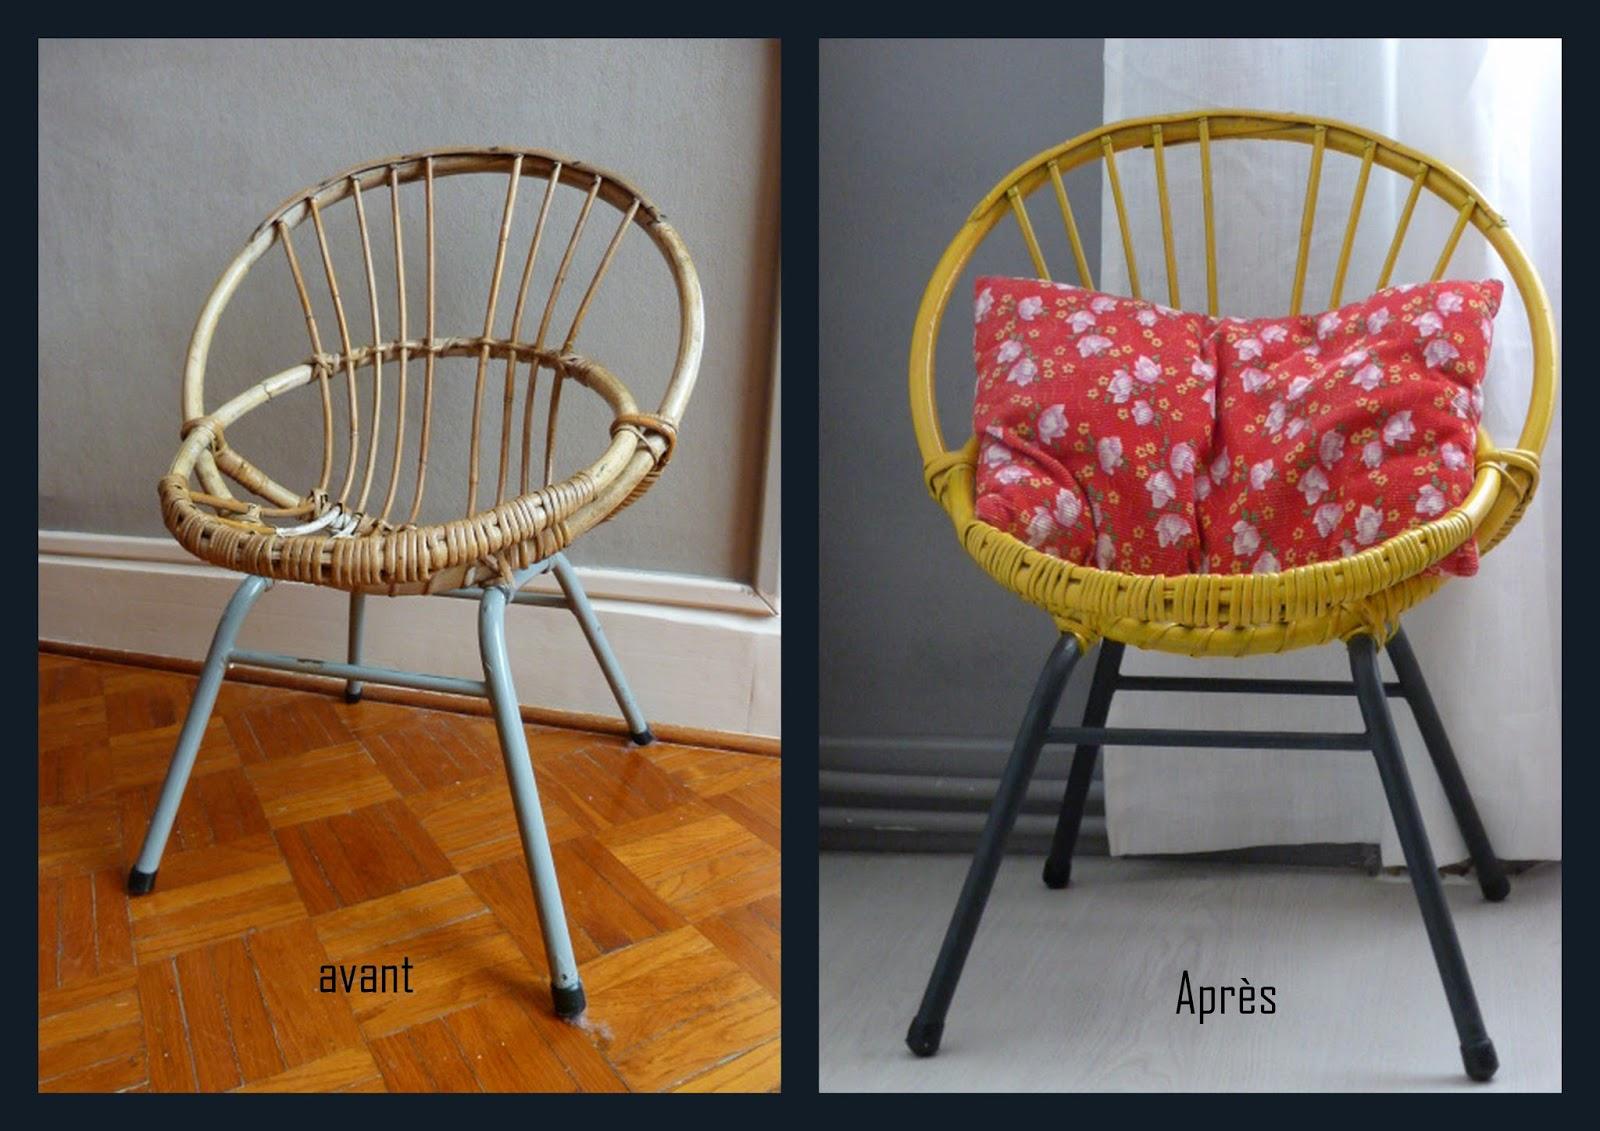 bouillondepoules la petite chaise. Black Bedroom Furniture Sets. Home Design Ideas